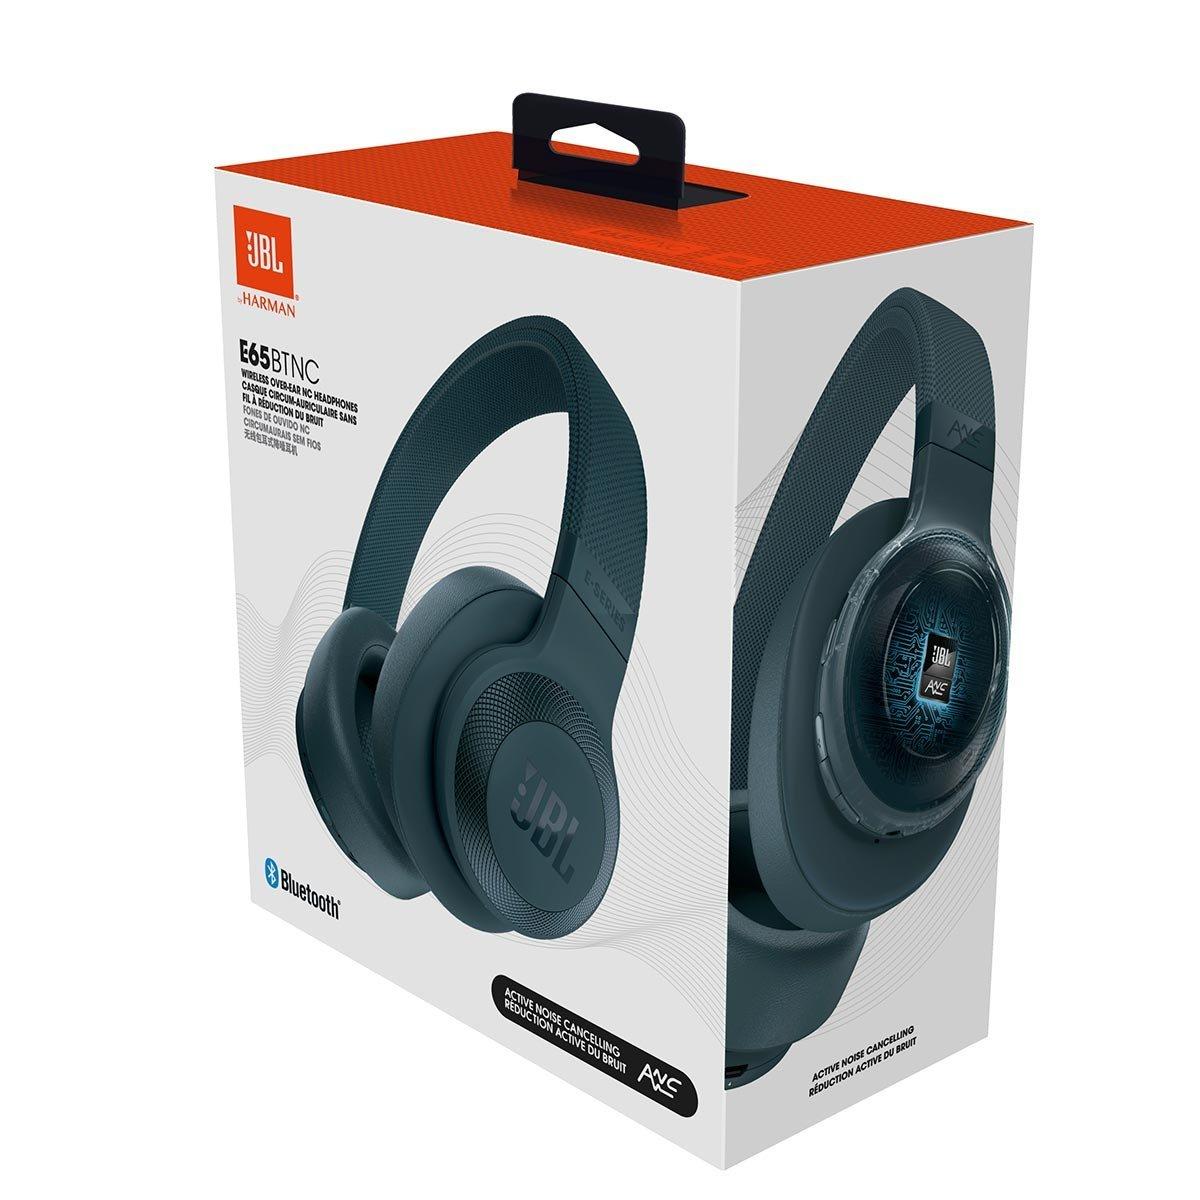 JBL E65BTNC Bluetooth Headphones Black